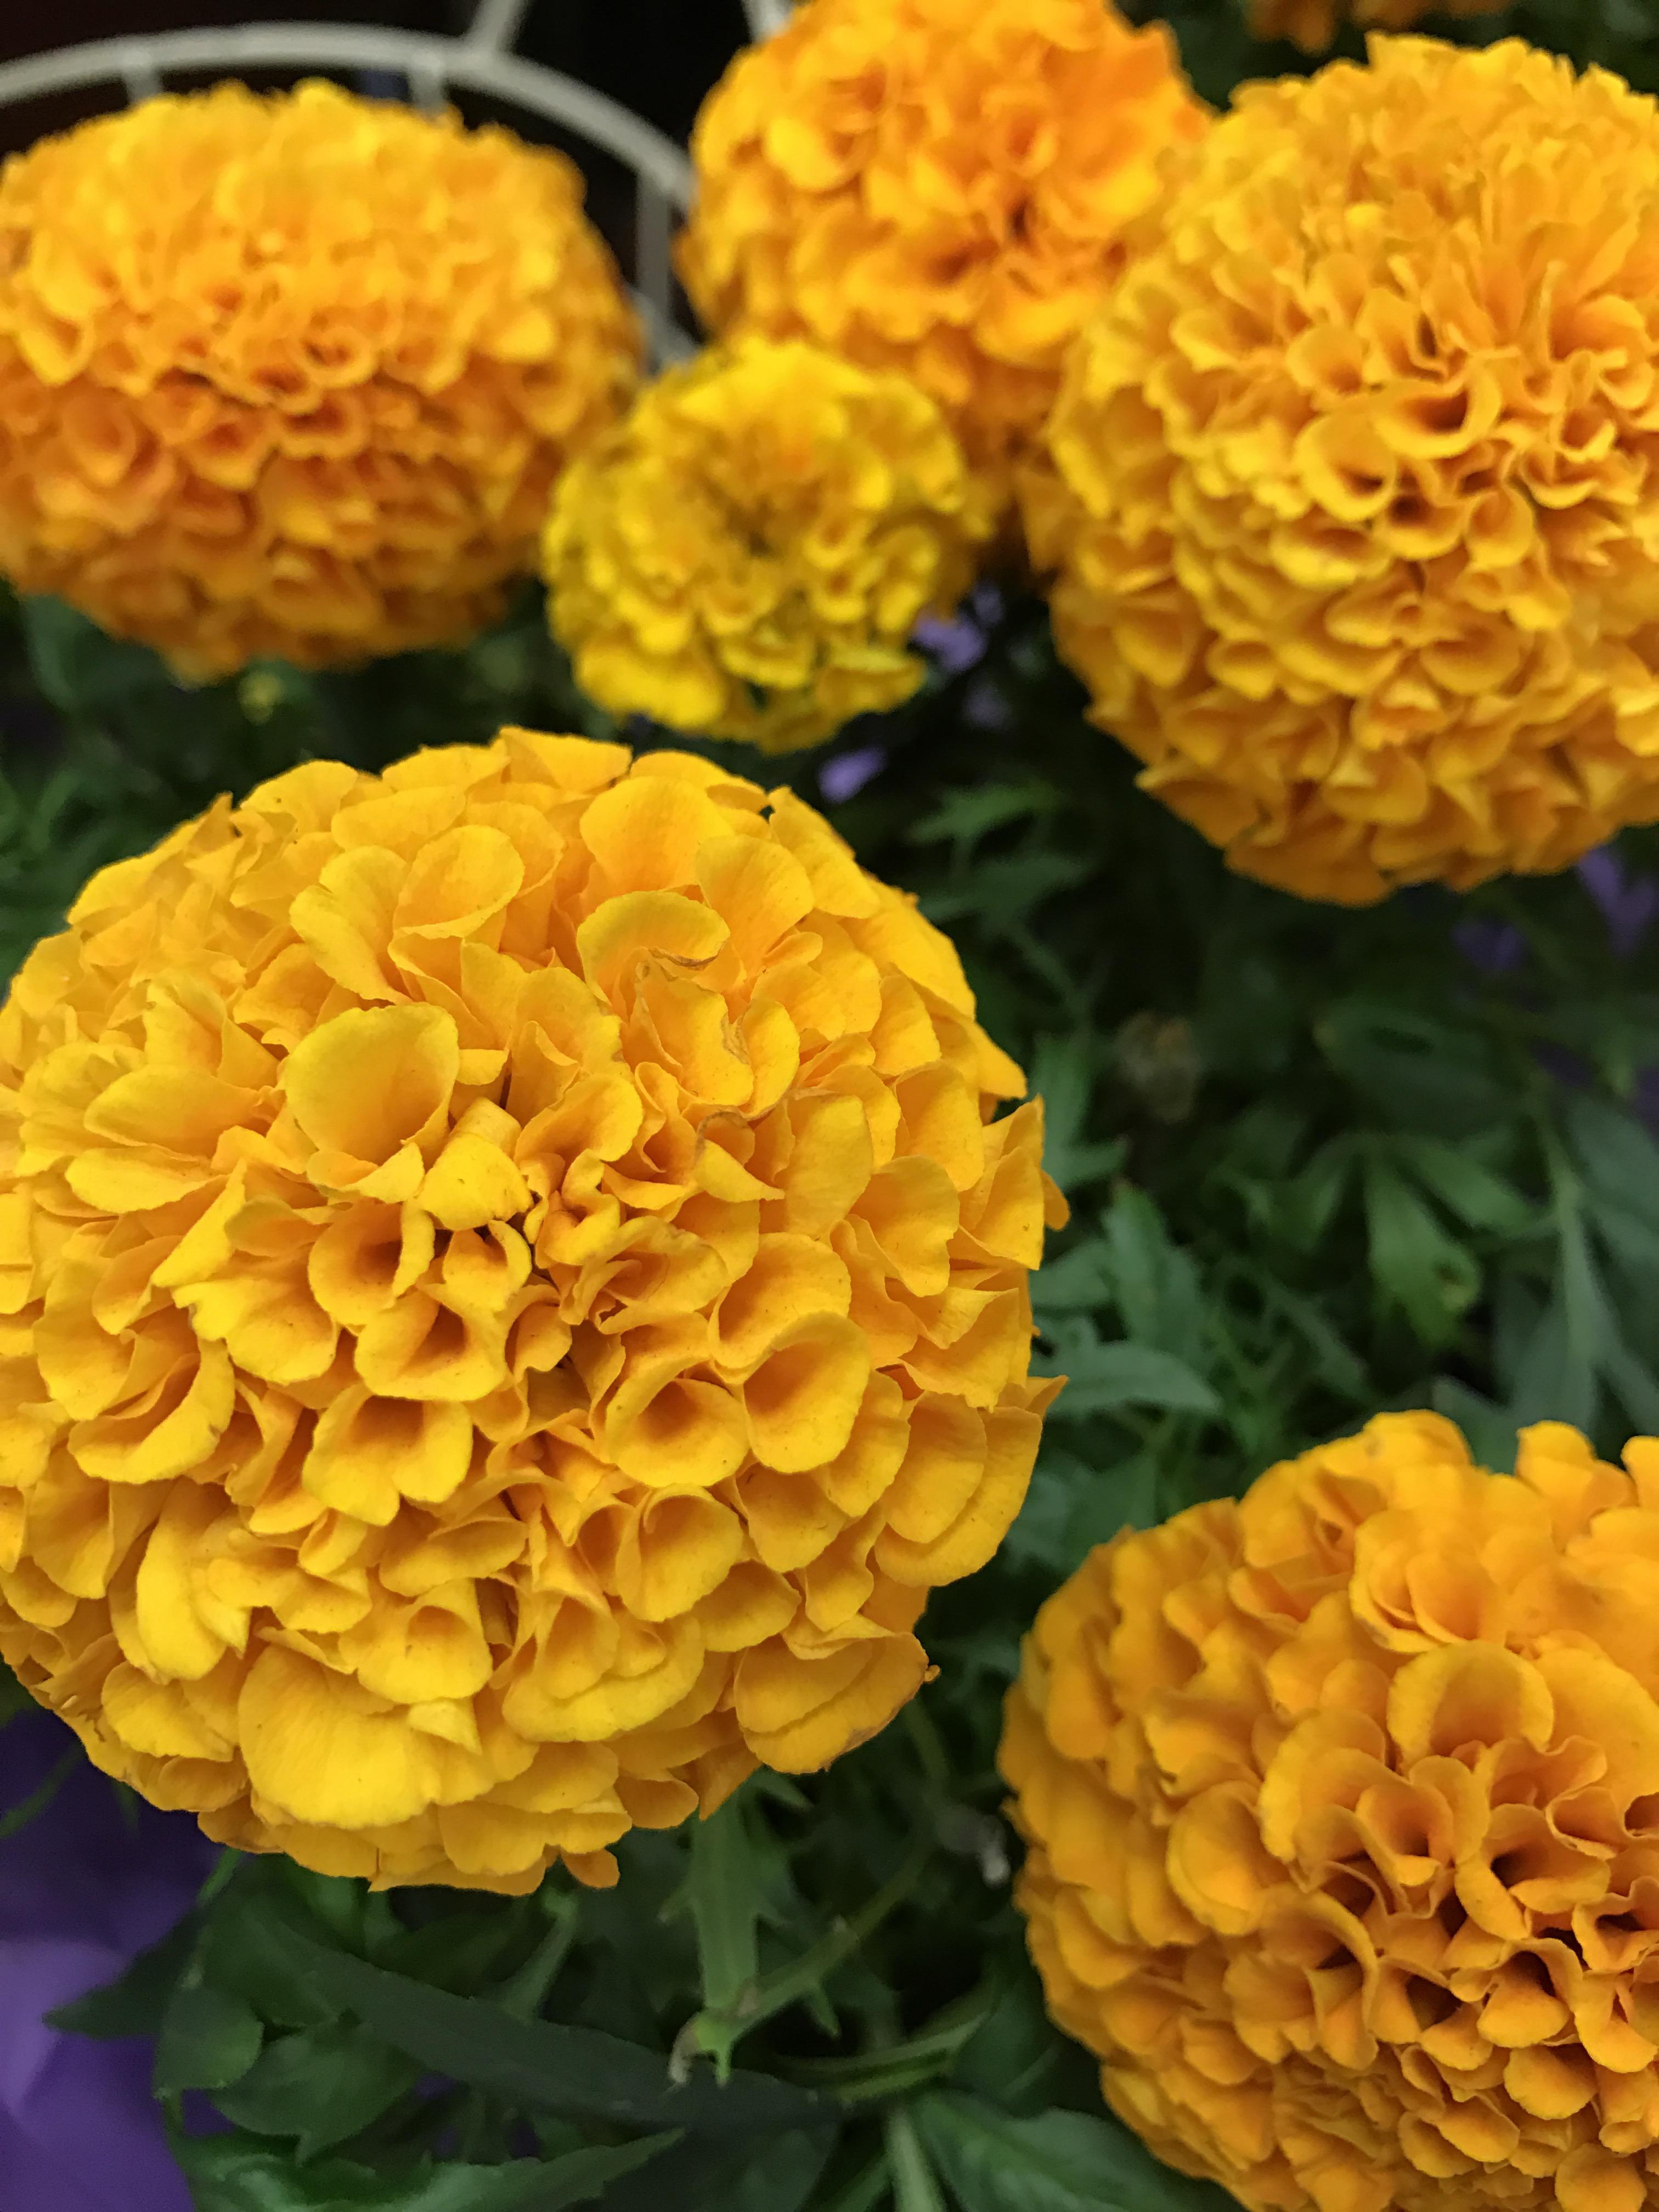 The Marigold Tarot Major Arcana The: Flower Of The Day – Marigold